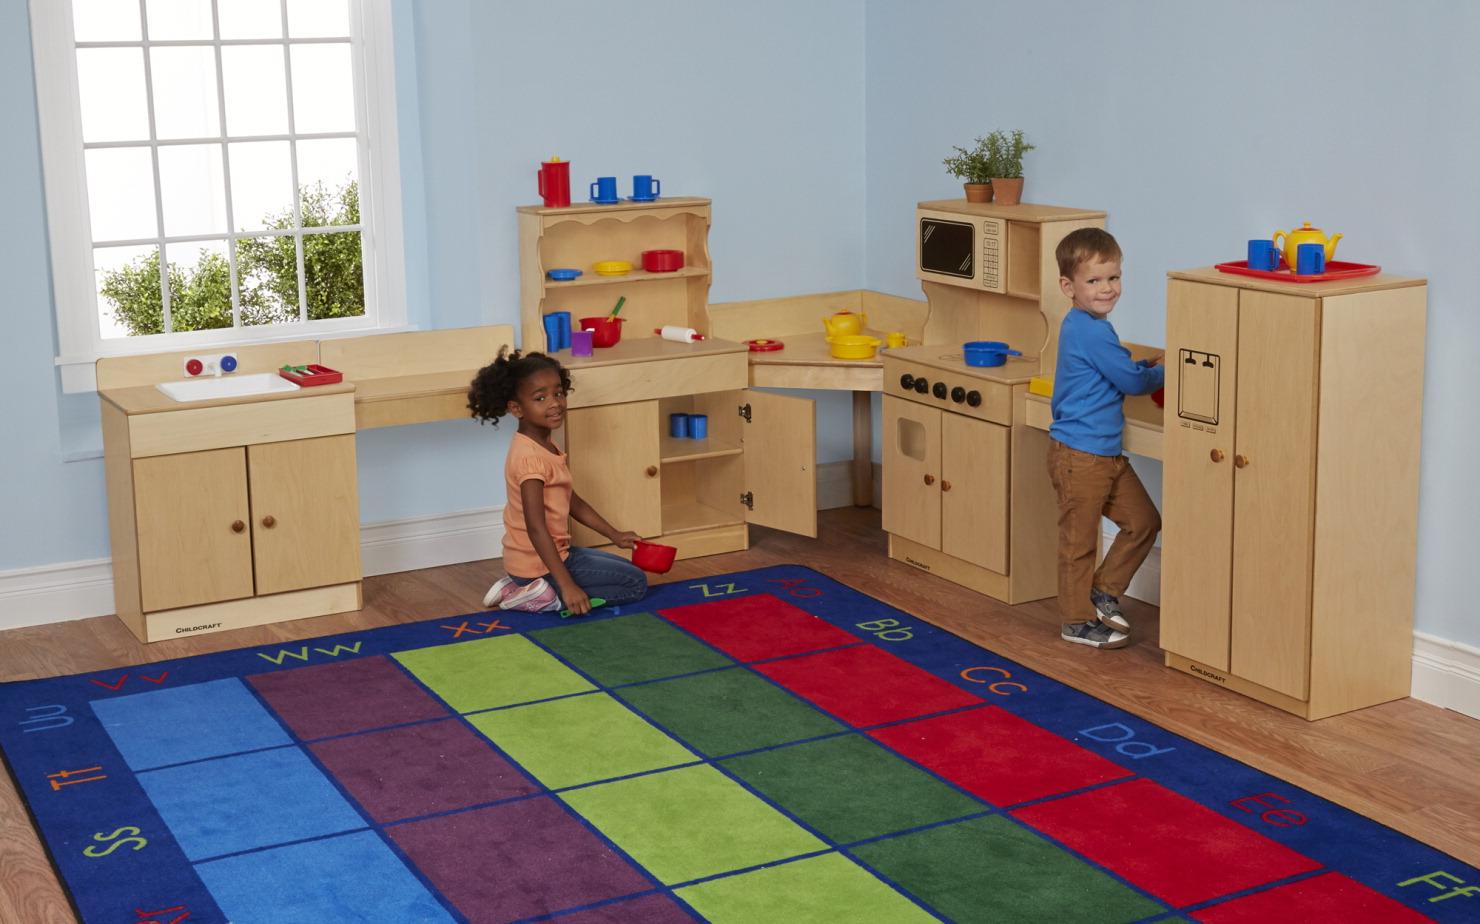 Childcraft traditional kitchen set 7 pieces school for Child craft play kitchen